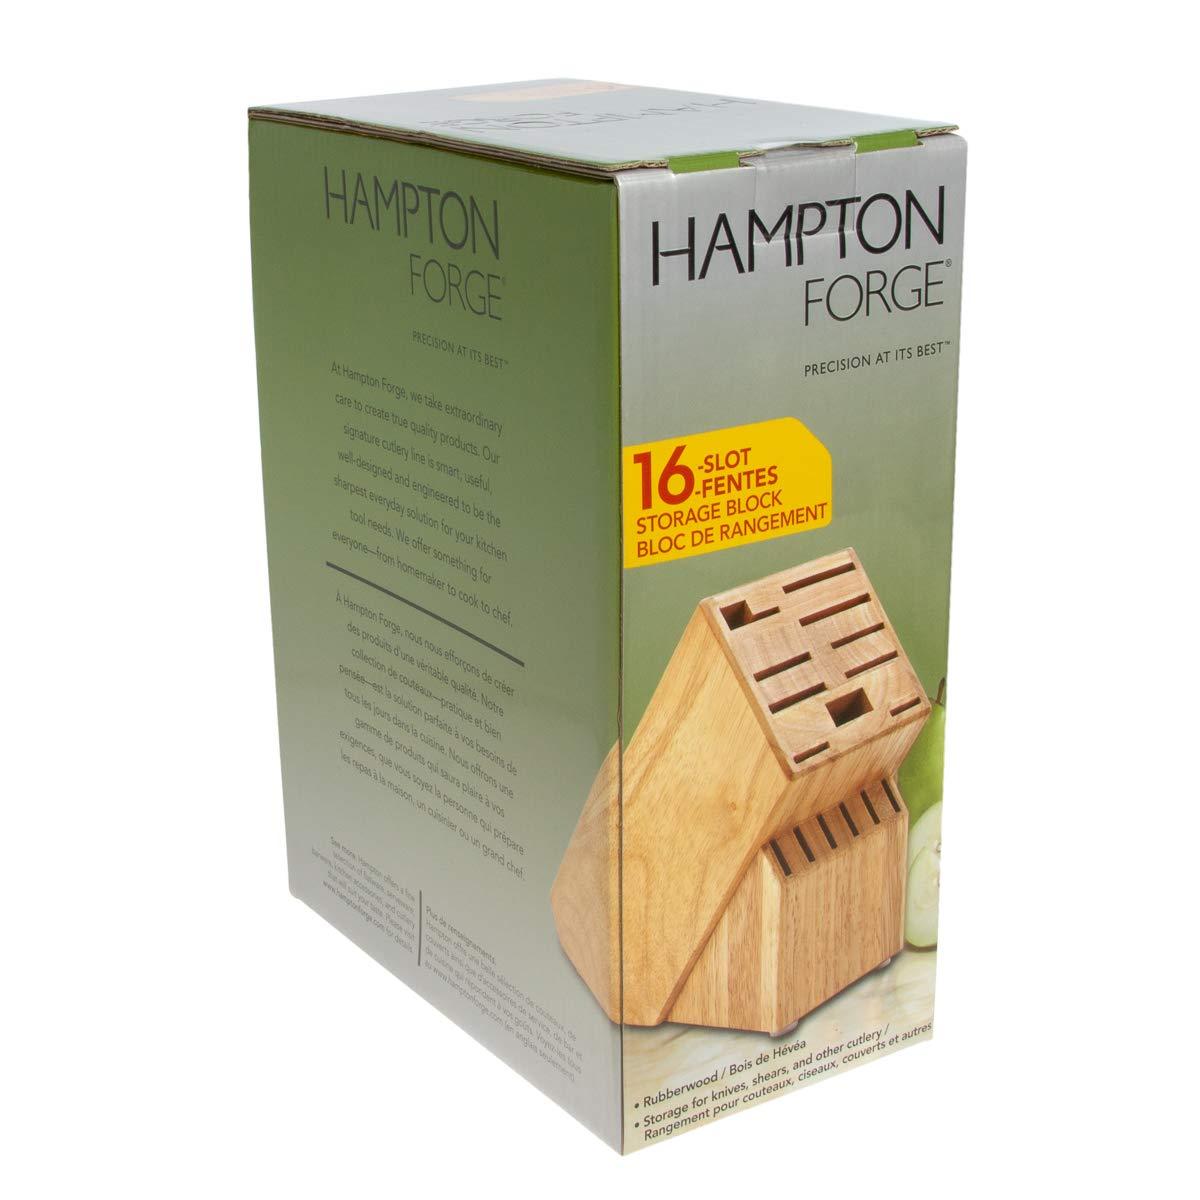 Hampton Forge 16-Slot Empty Cutlery Block, Wood, HMC01B016G by Hampton Forge Cutlery (Image #4)